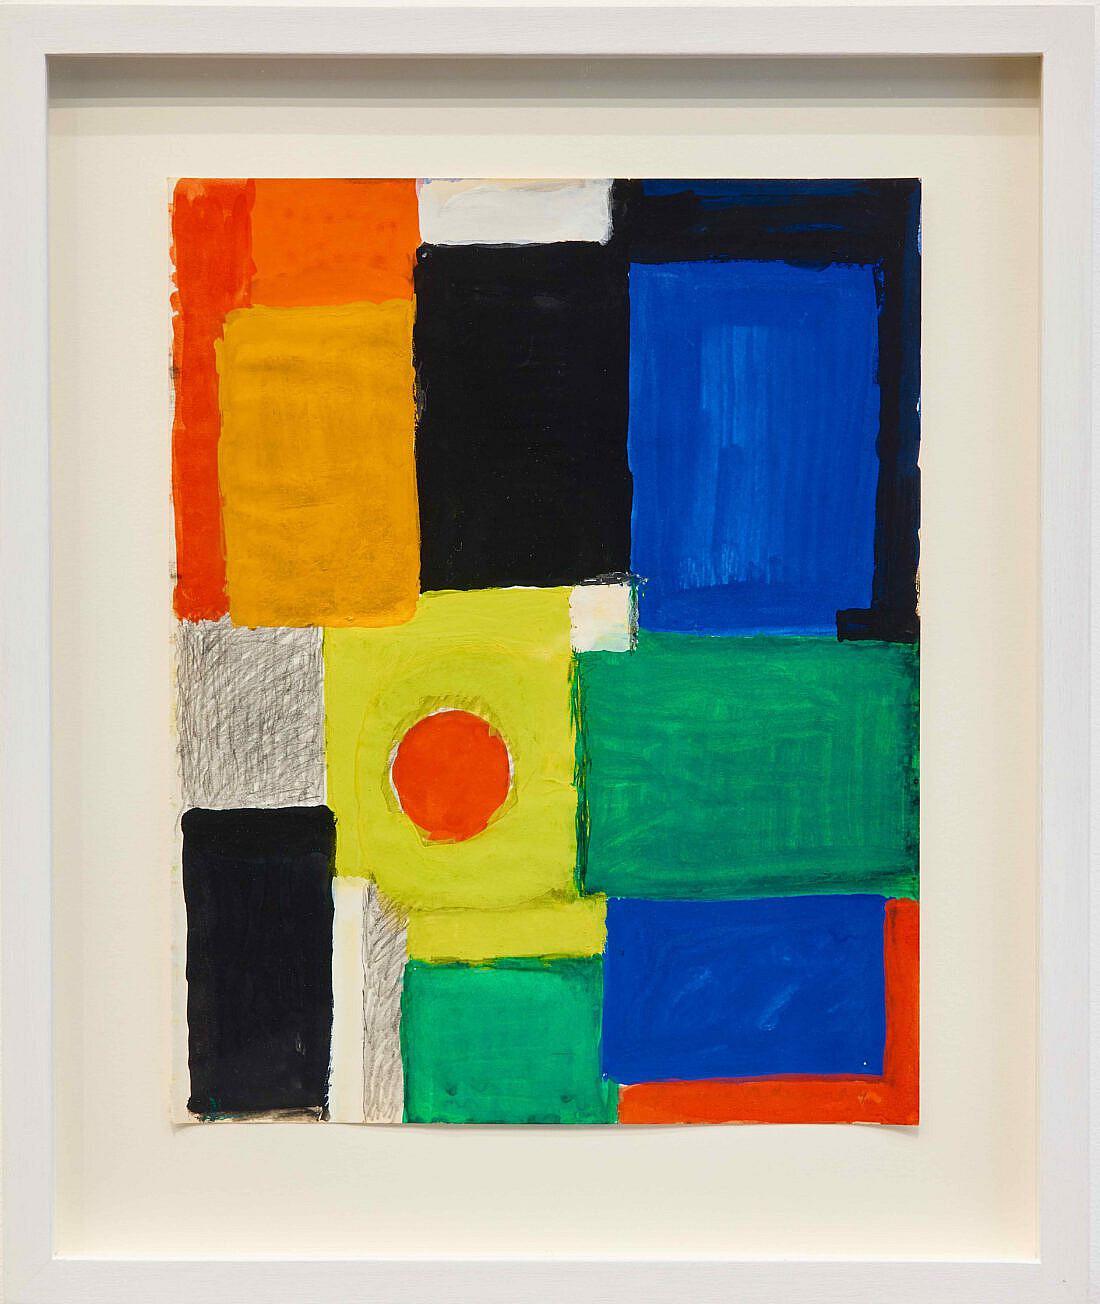 Sonia Delaunay Rythme Couleur, 1971